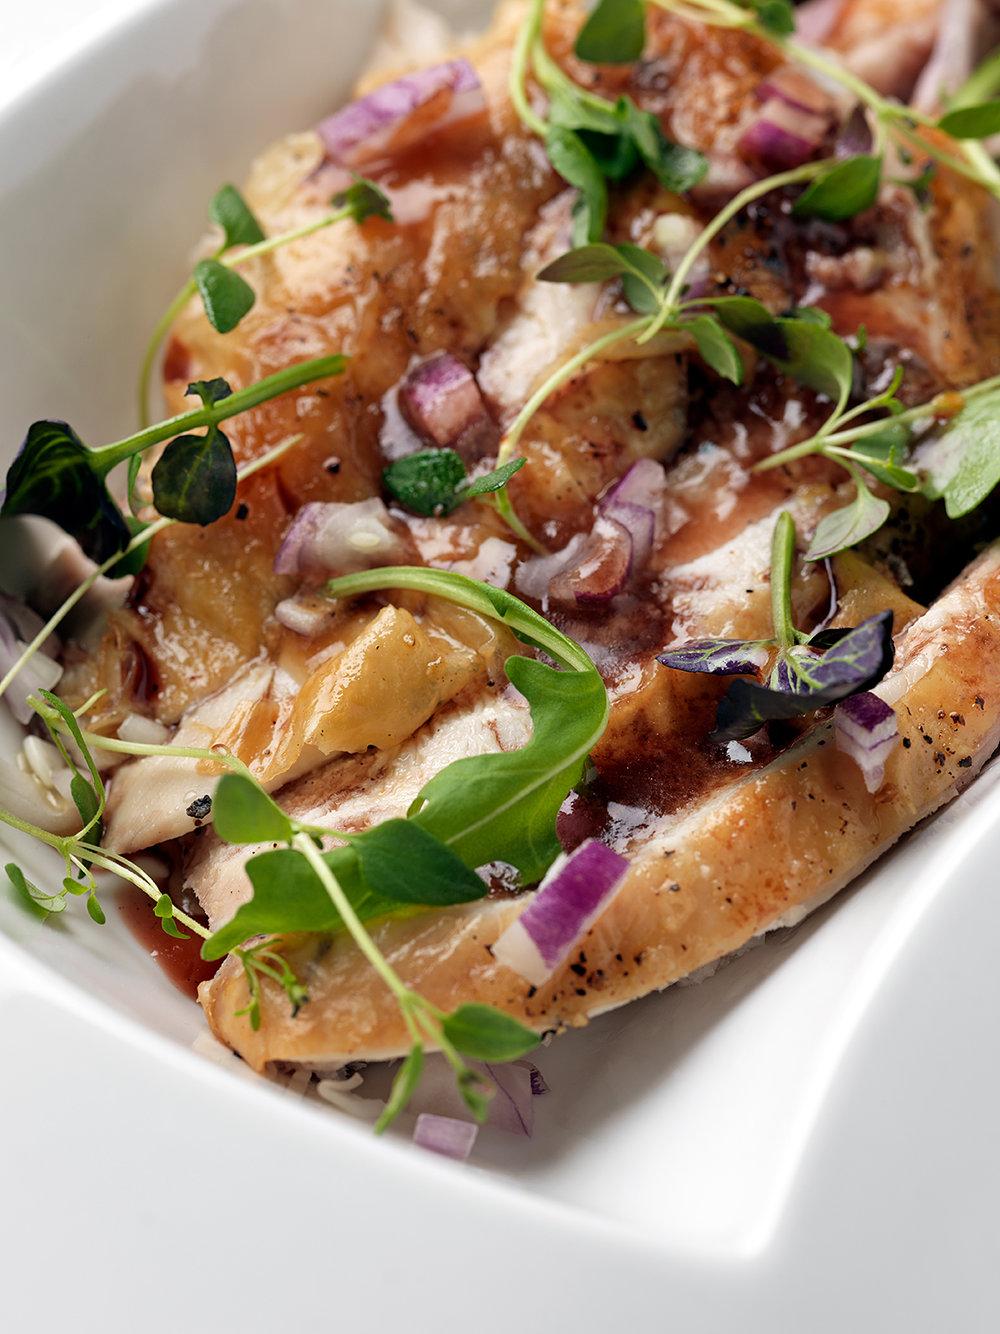 Roast chicken in a Merlot reduction sauce